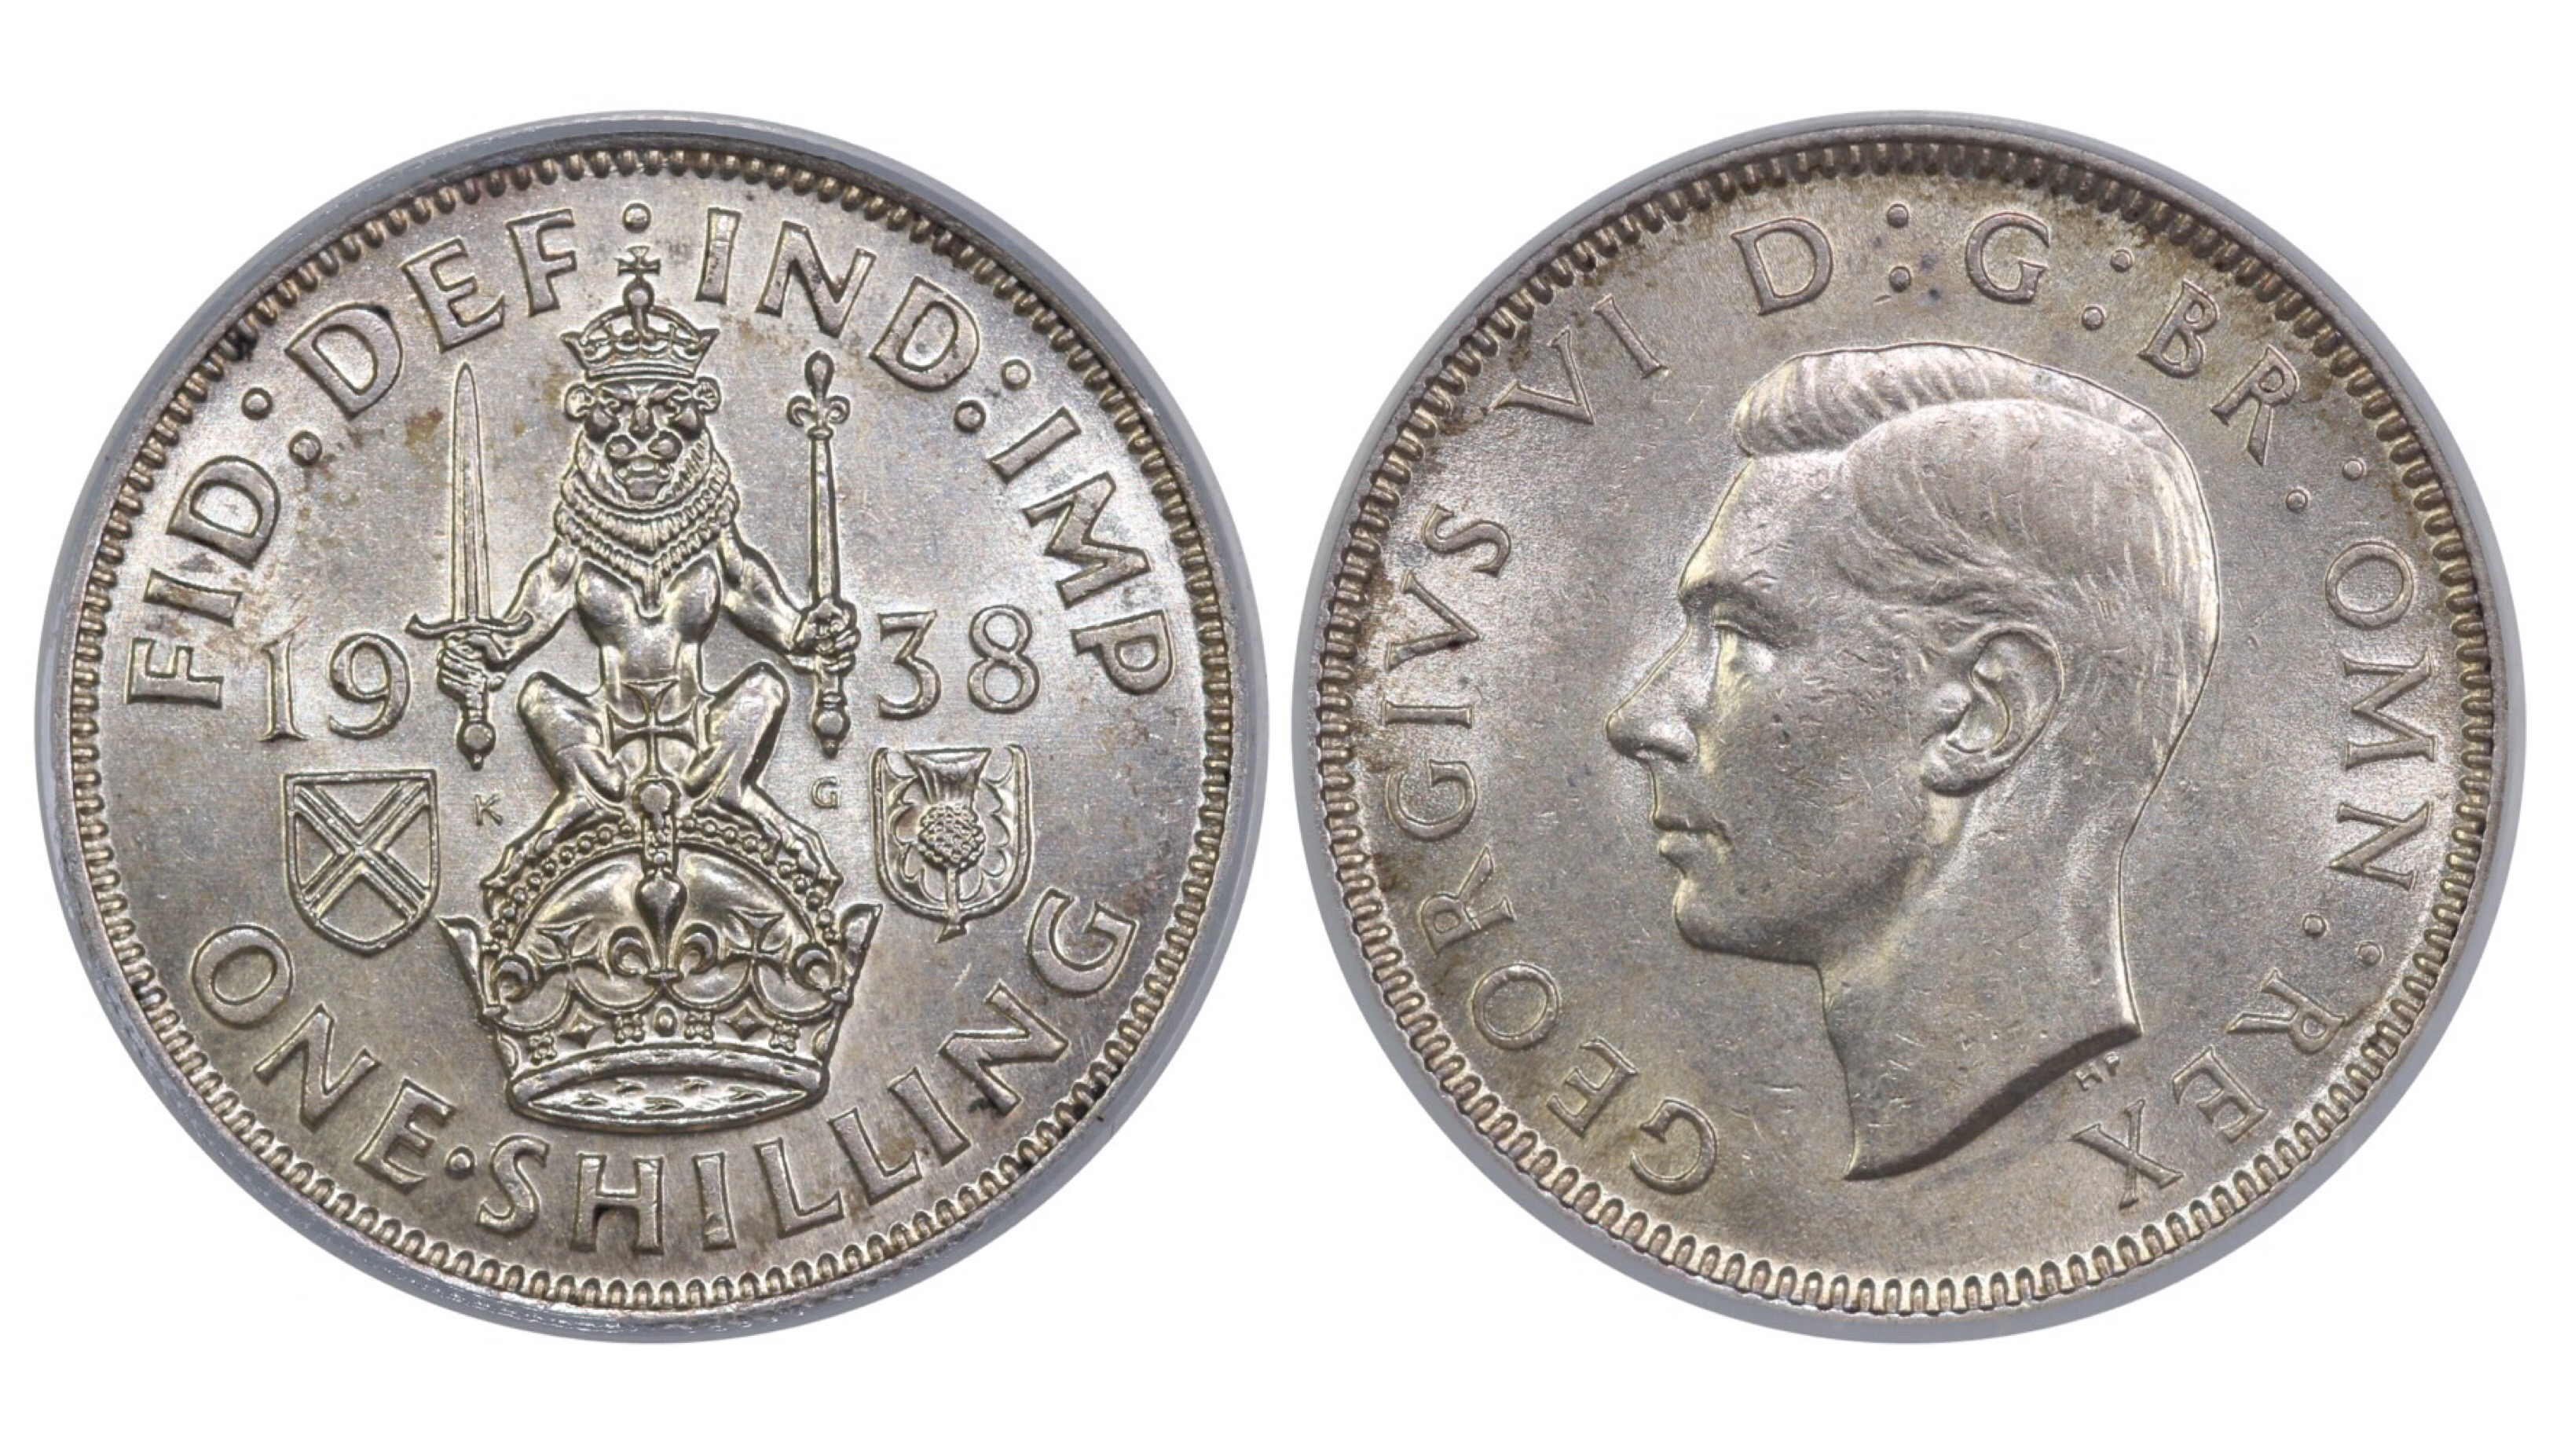 1938 'Scottish' Shilling, CGS 65, George VI, ESC 1455, UIN 21675